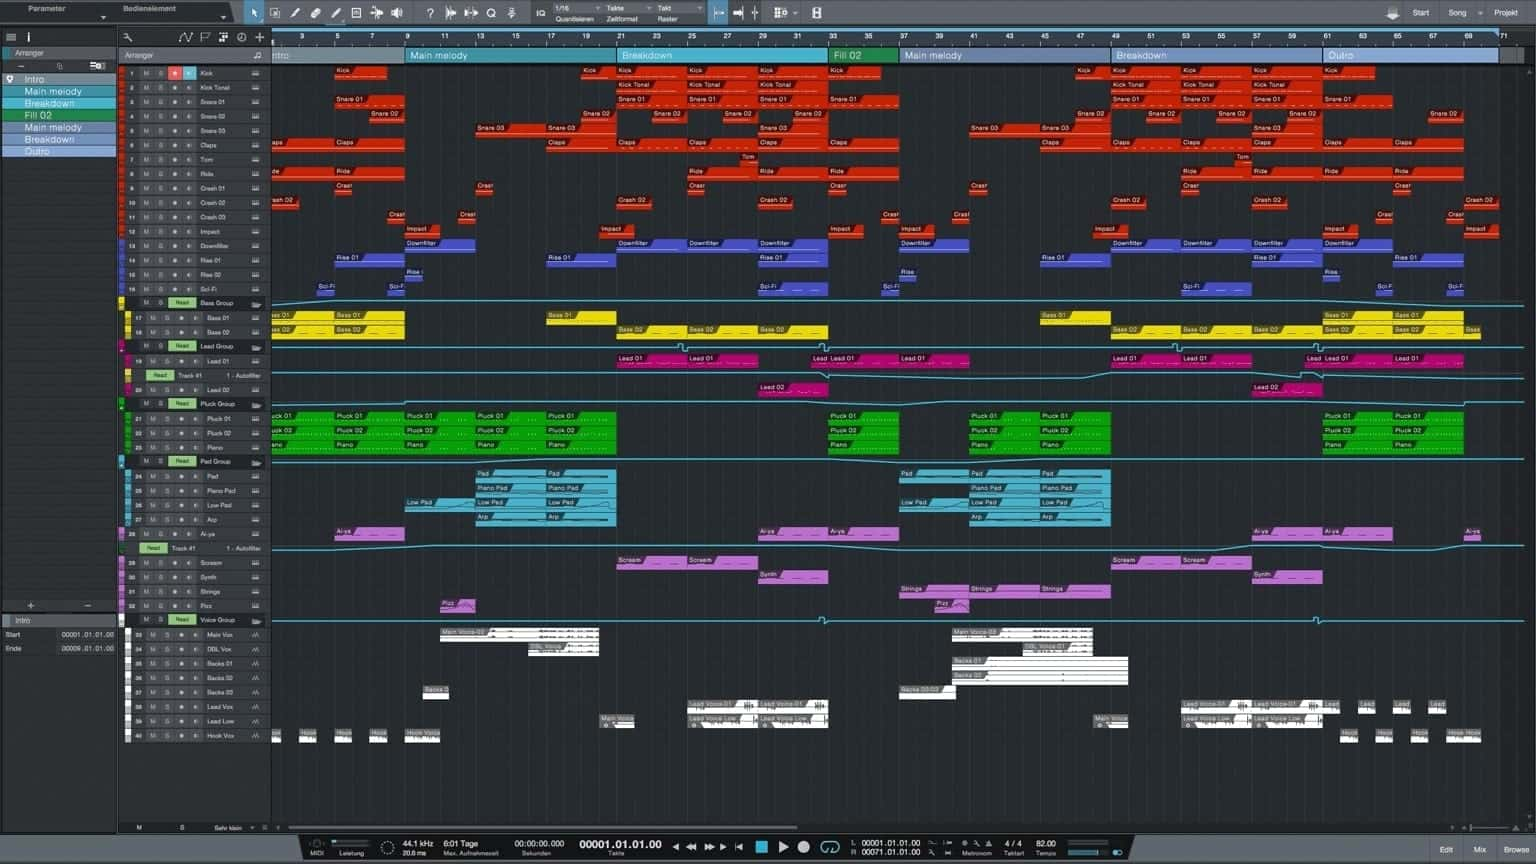 Allrights-Studio-One-Pro-Template1